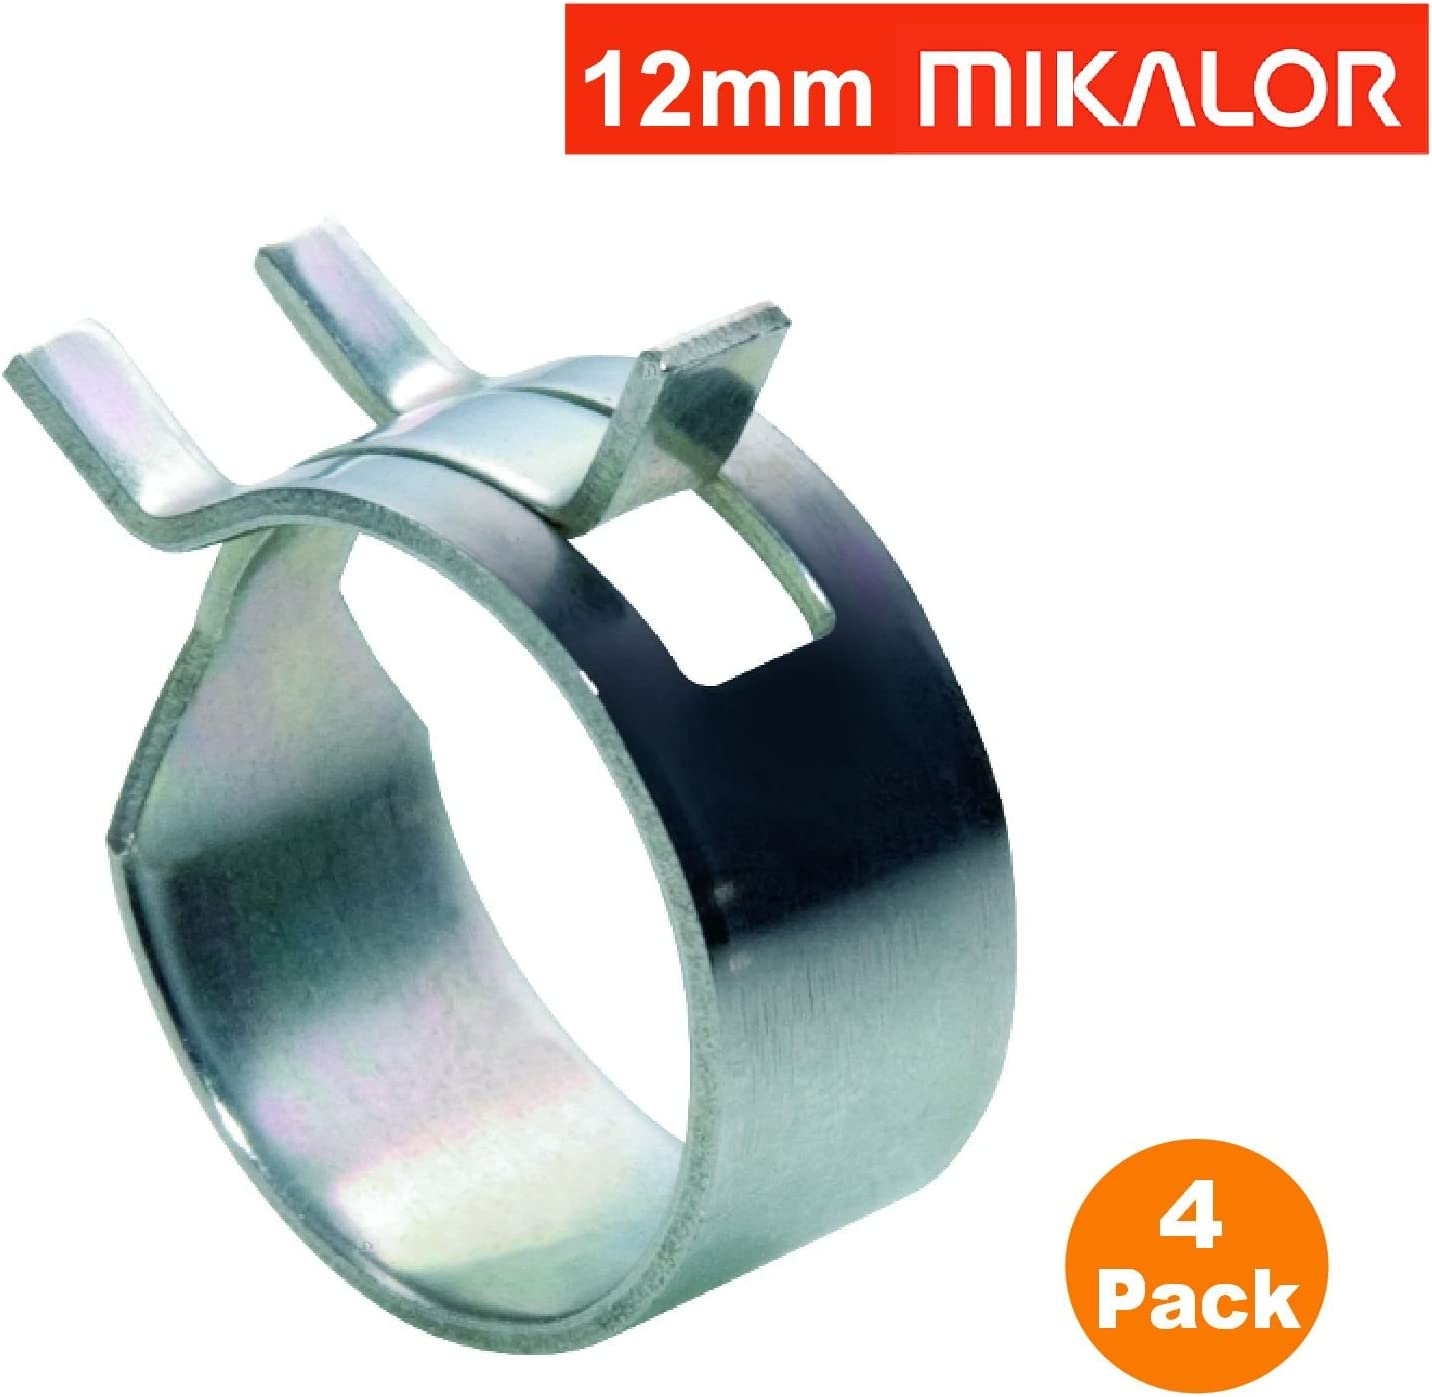 Mikalor 4 x 14mm W1 selbst Klemmfeder Schlauch Clips Silikon Rohr Luft-Kraftstoff-Band